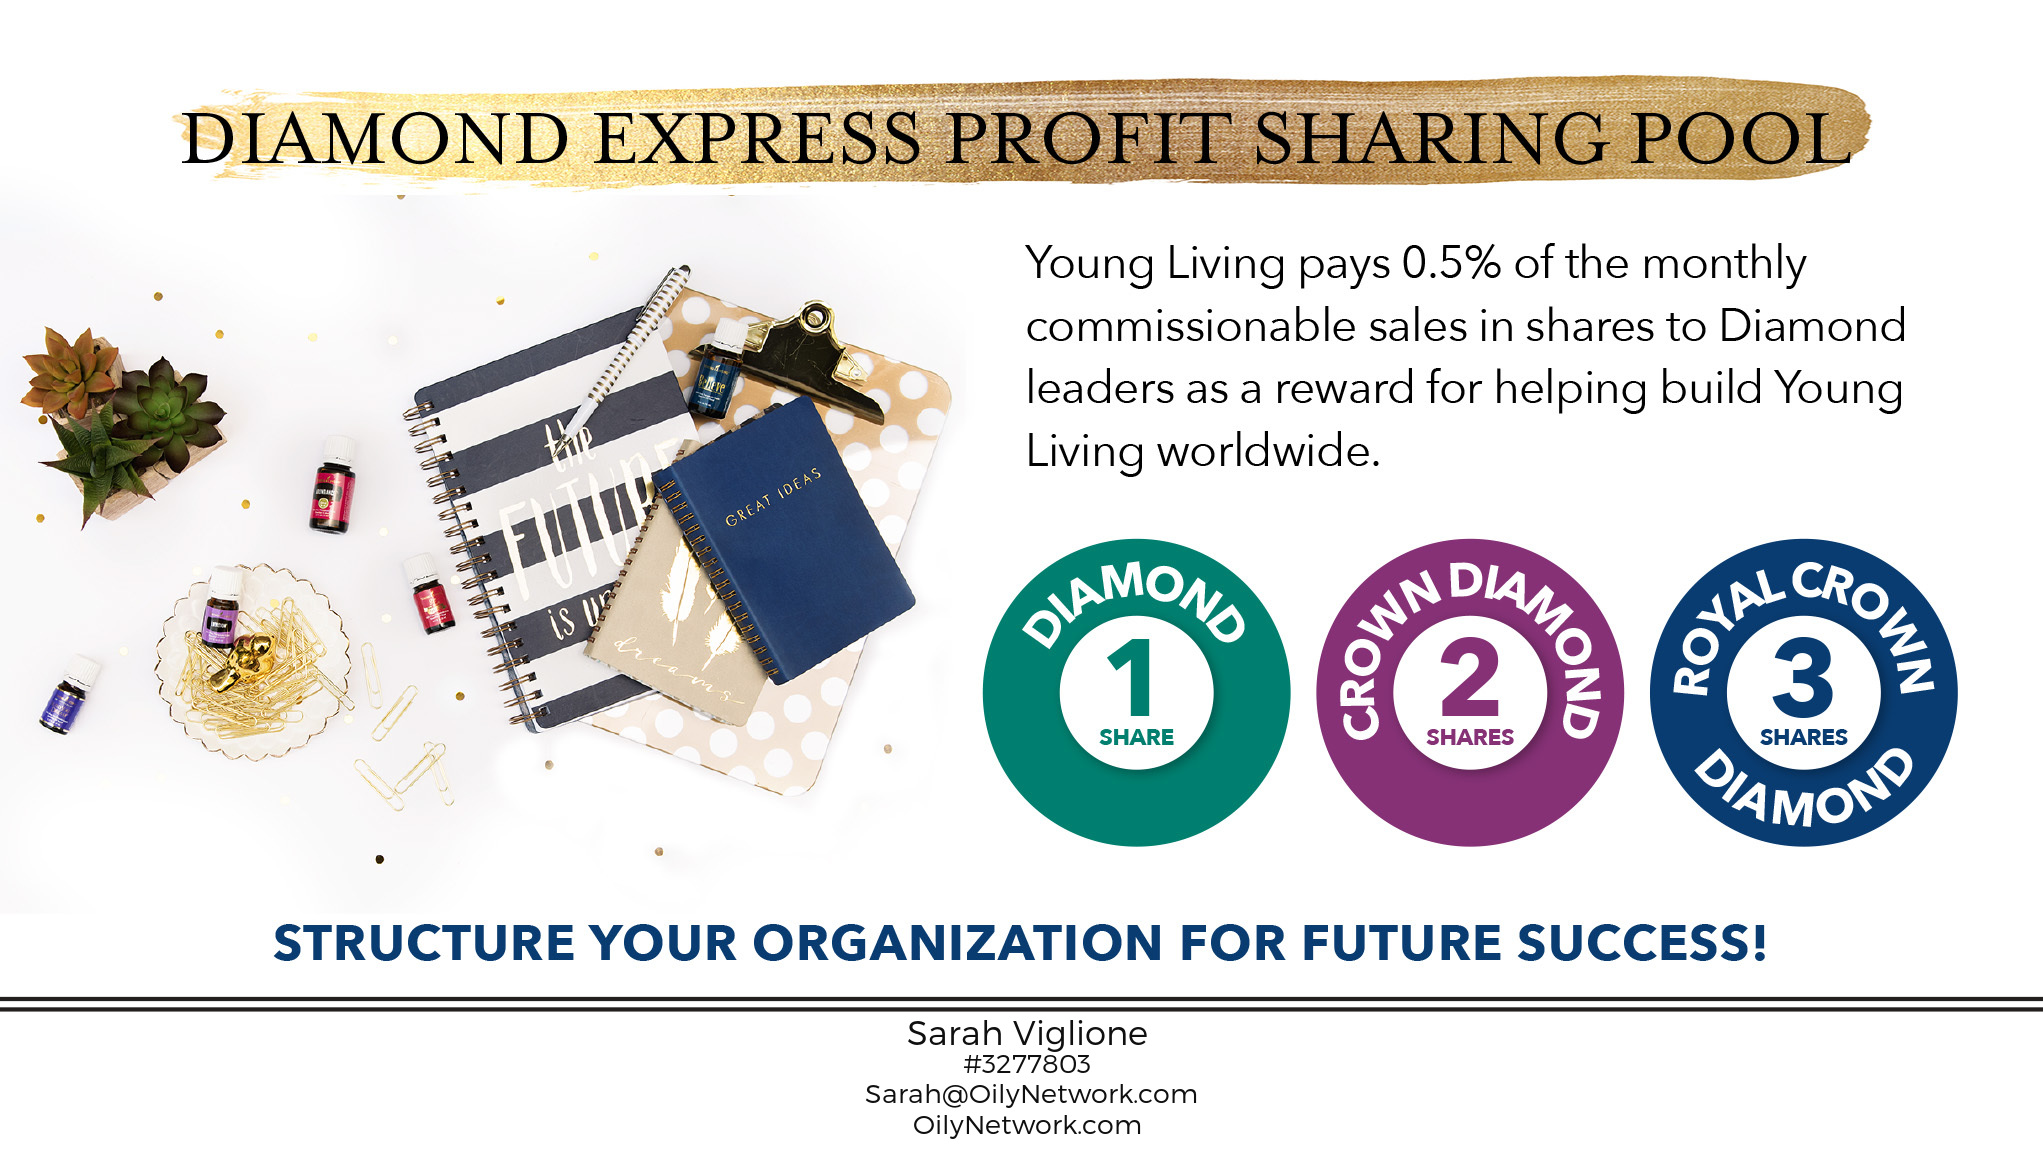 Diamond Express Profit Sharing Pool